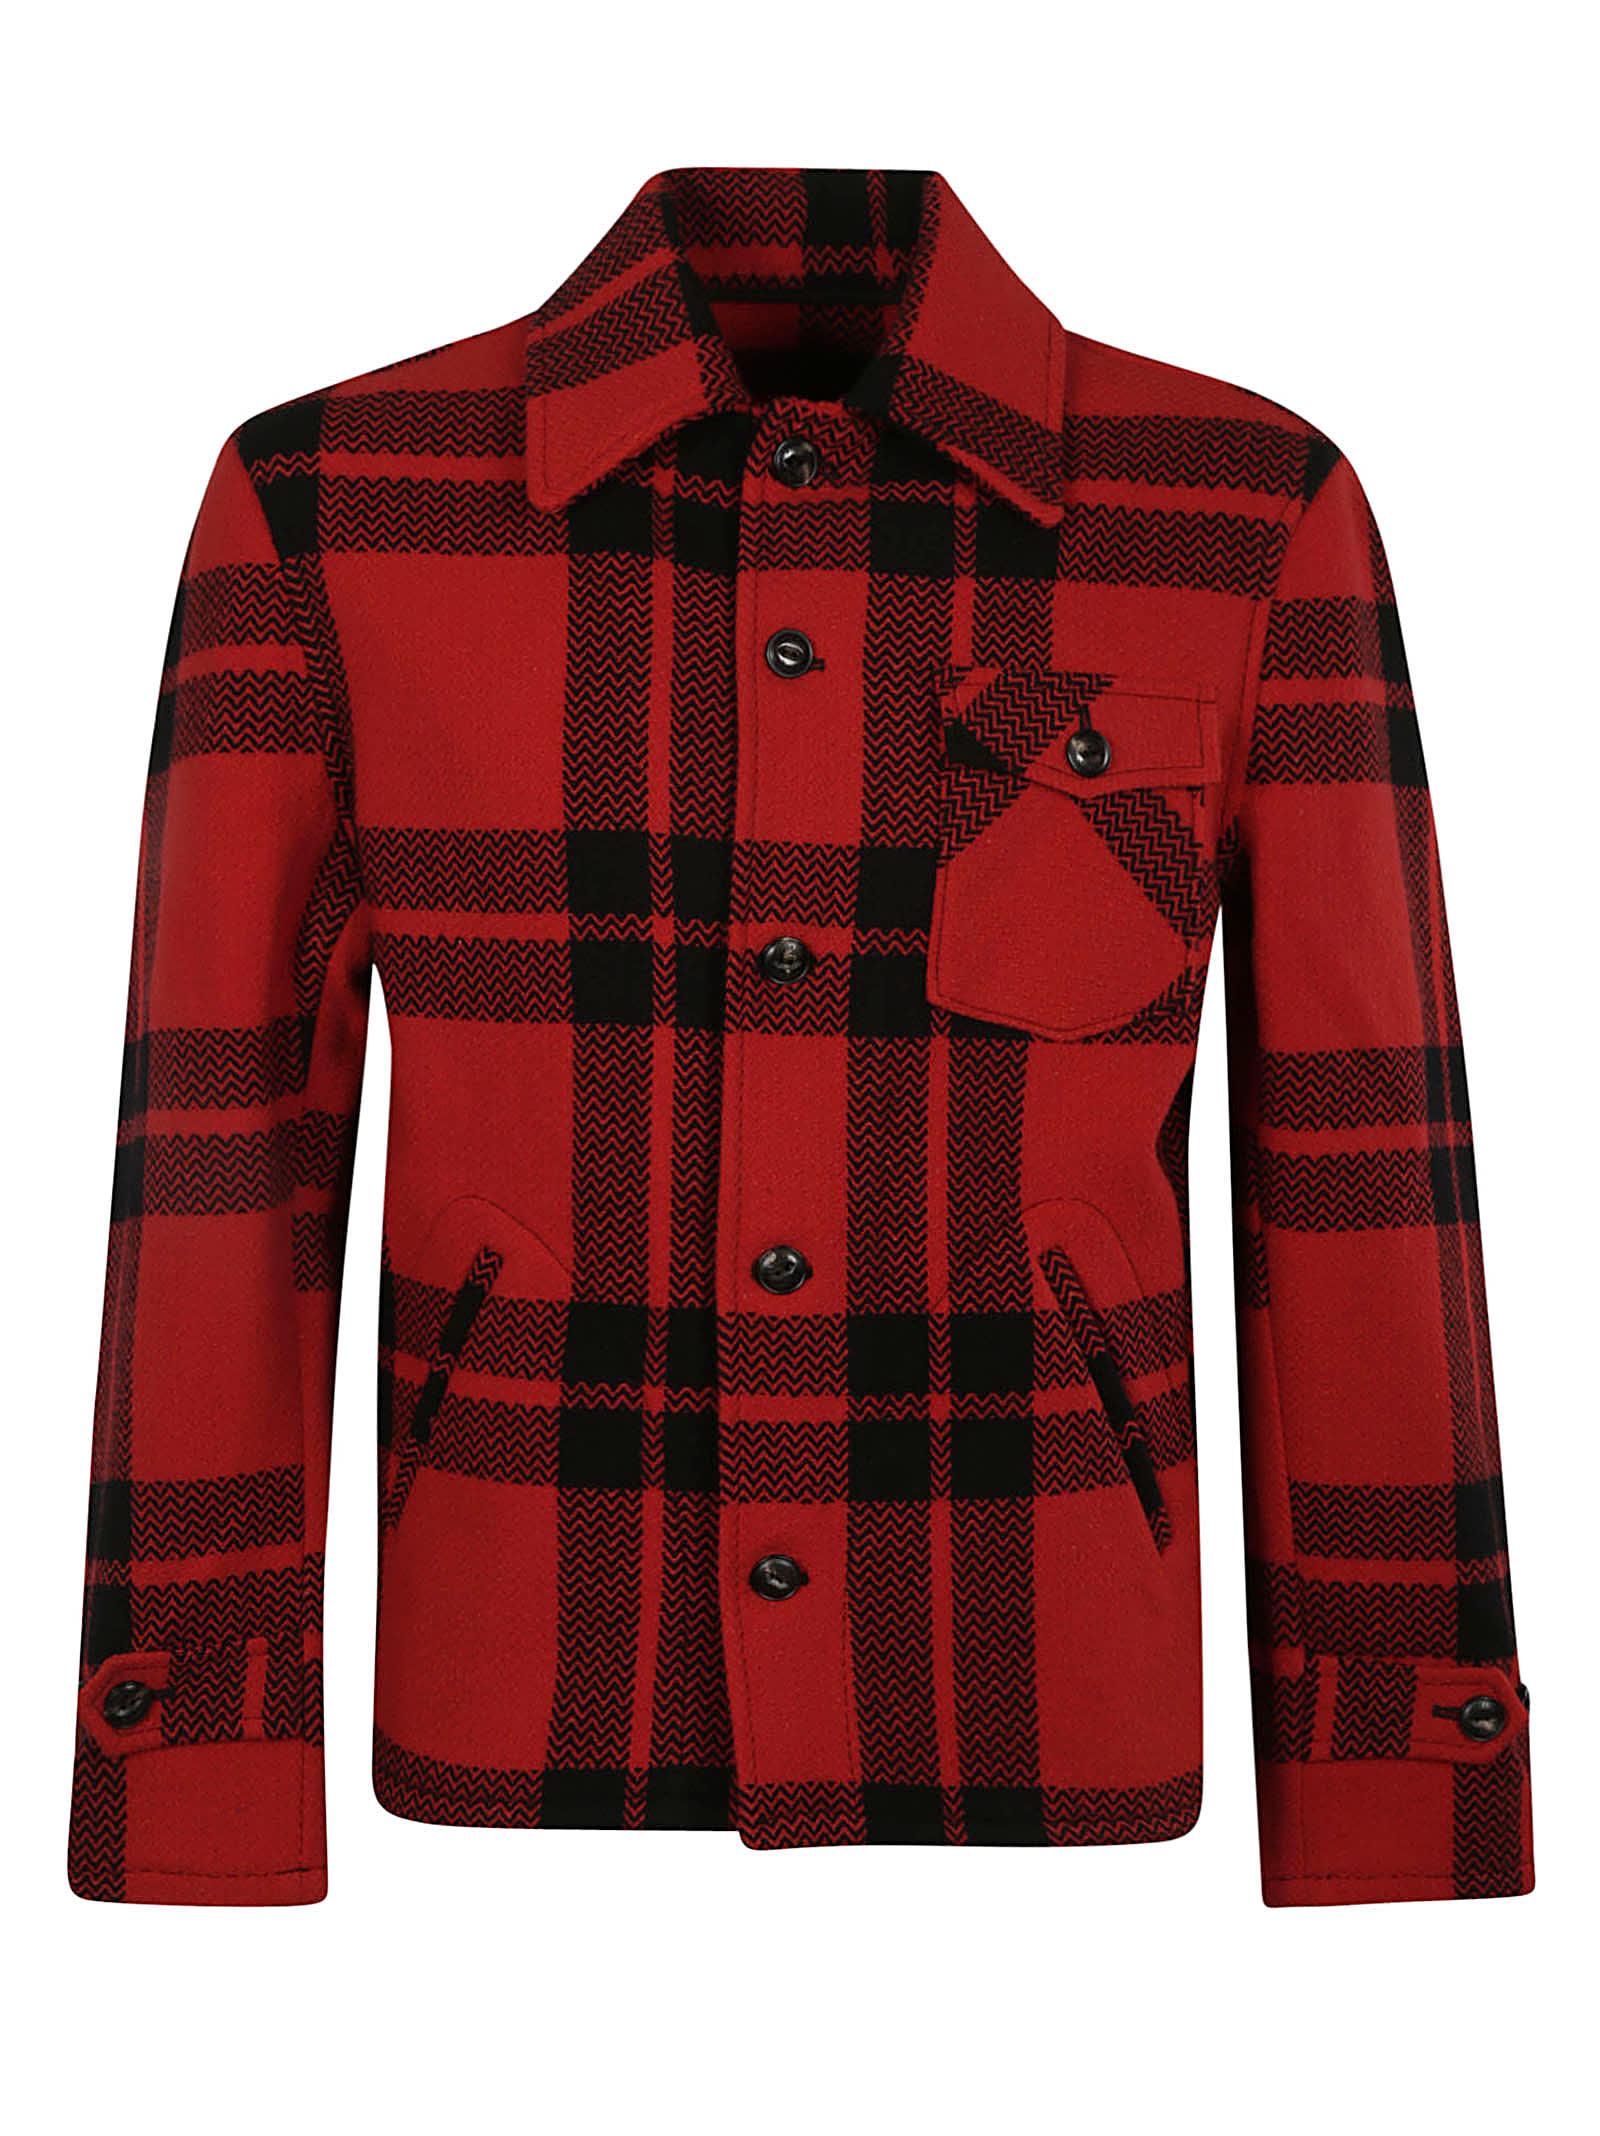 Nebraska Shirt Jacket